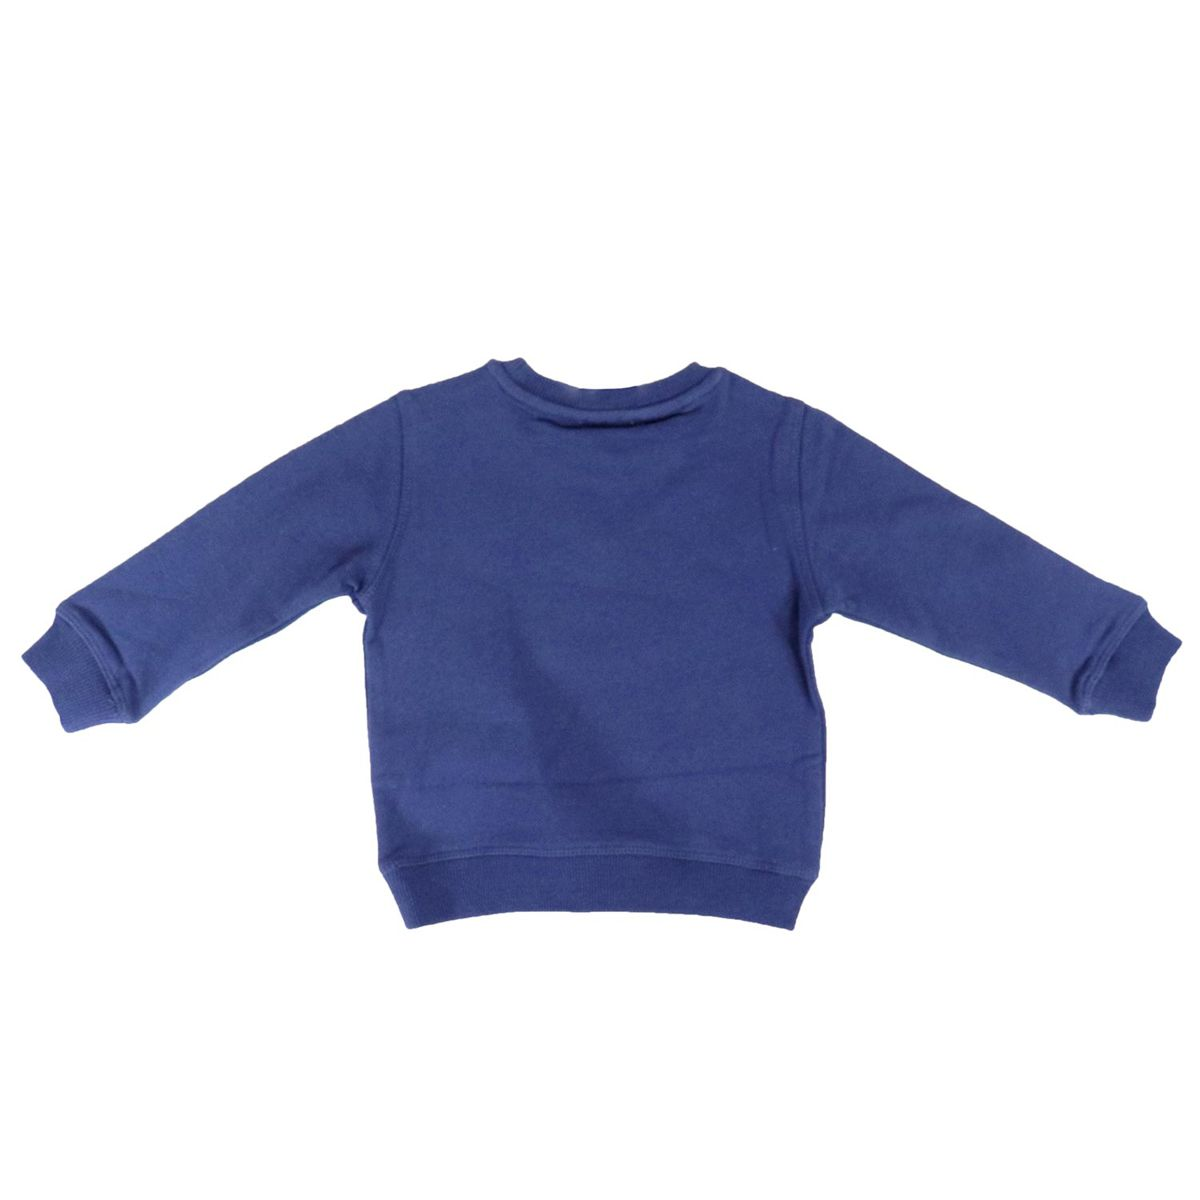 Cotton crewneck sweatshirt with Tiger logo patch Blue Kenzo